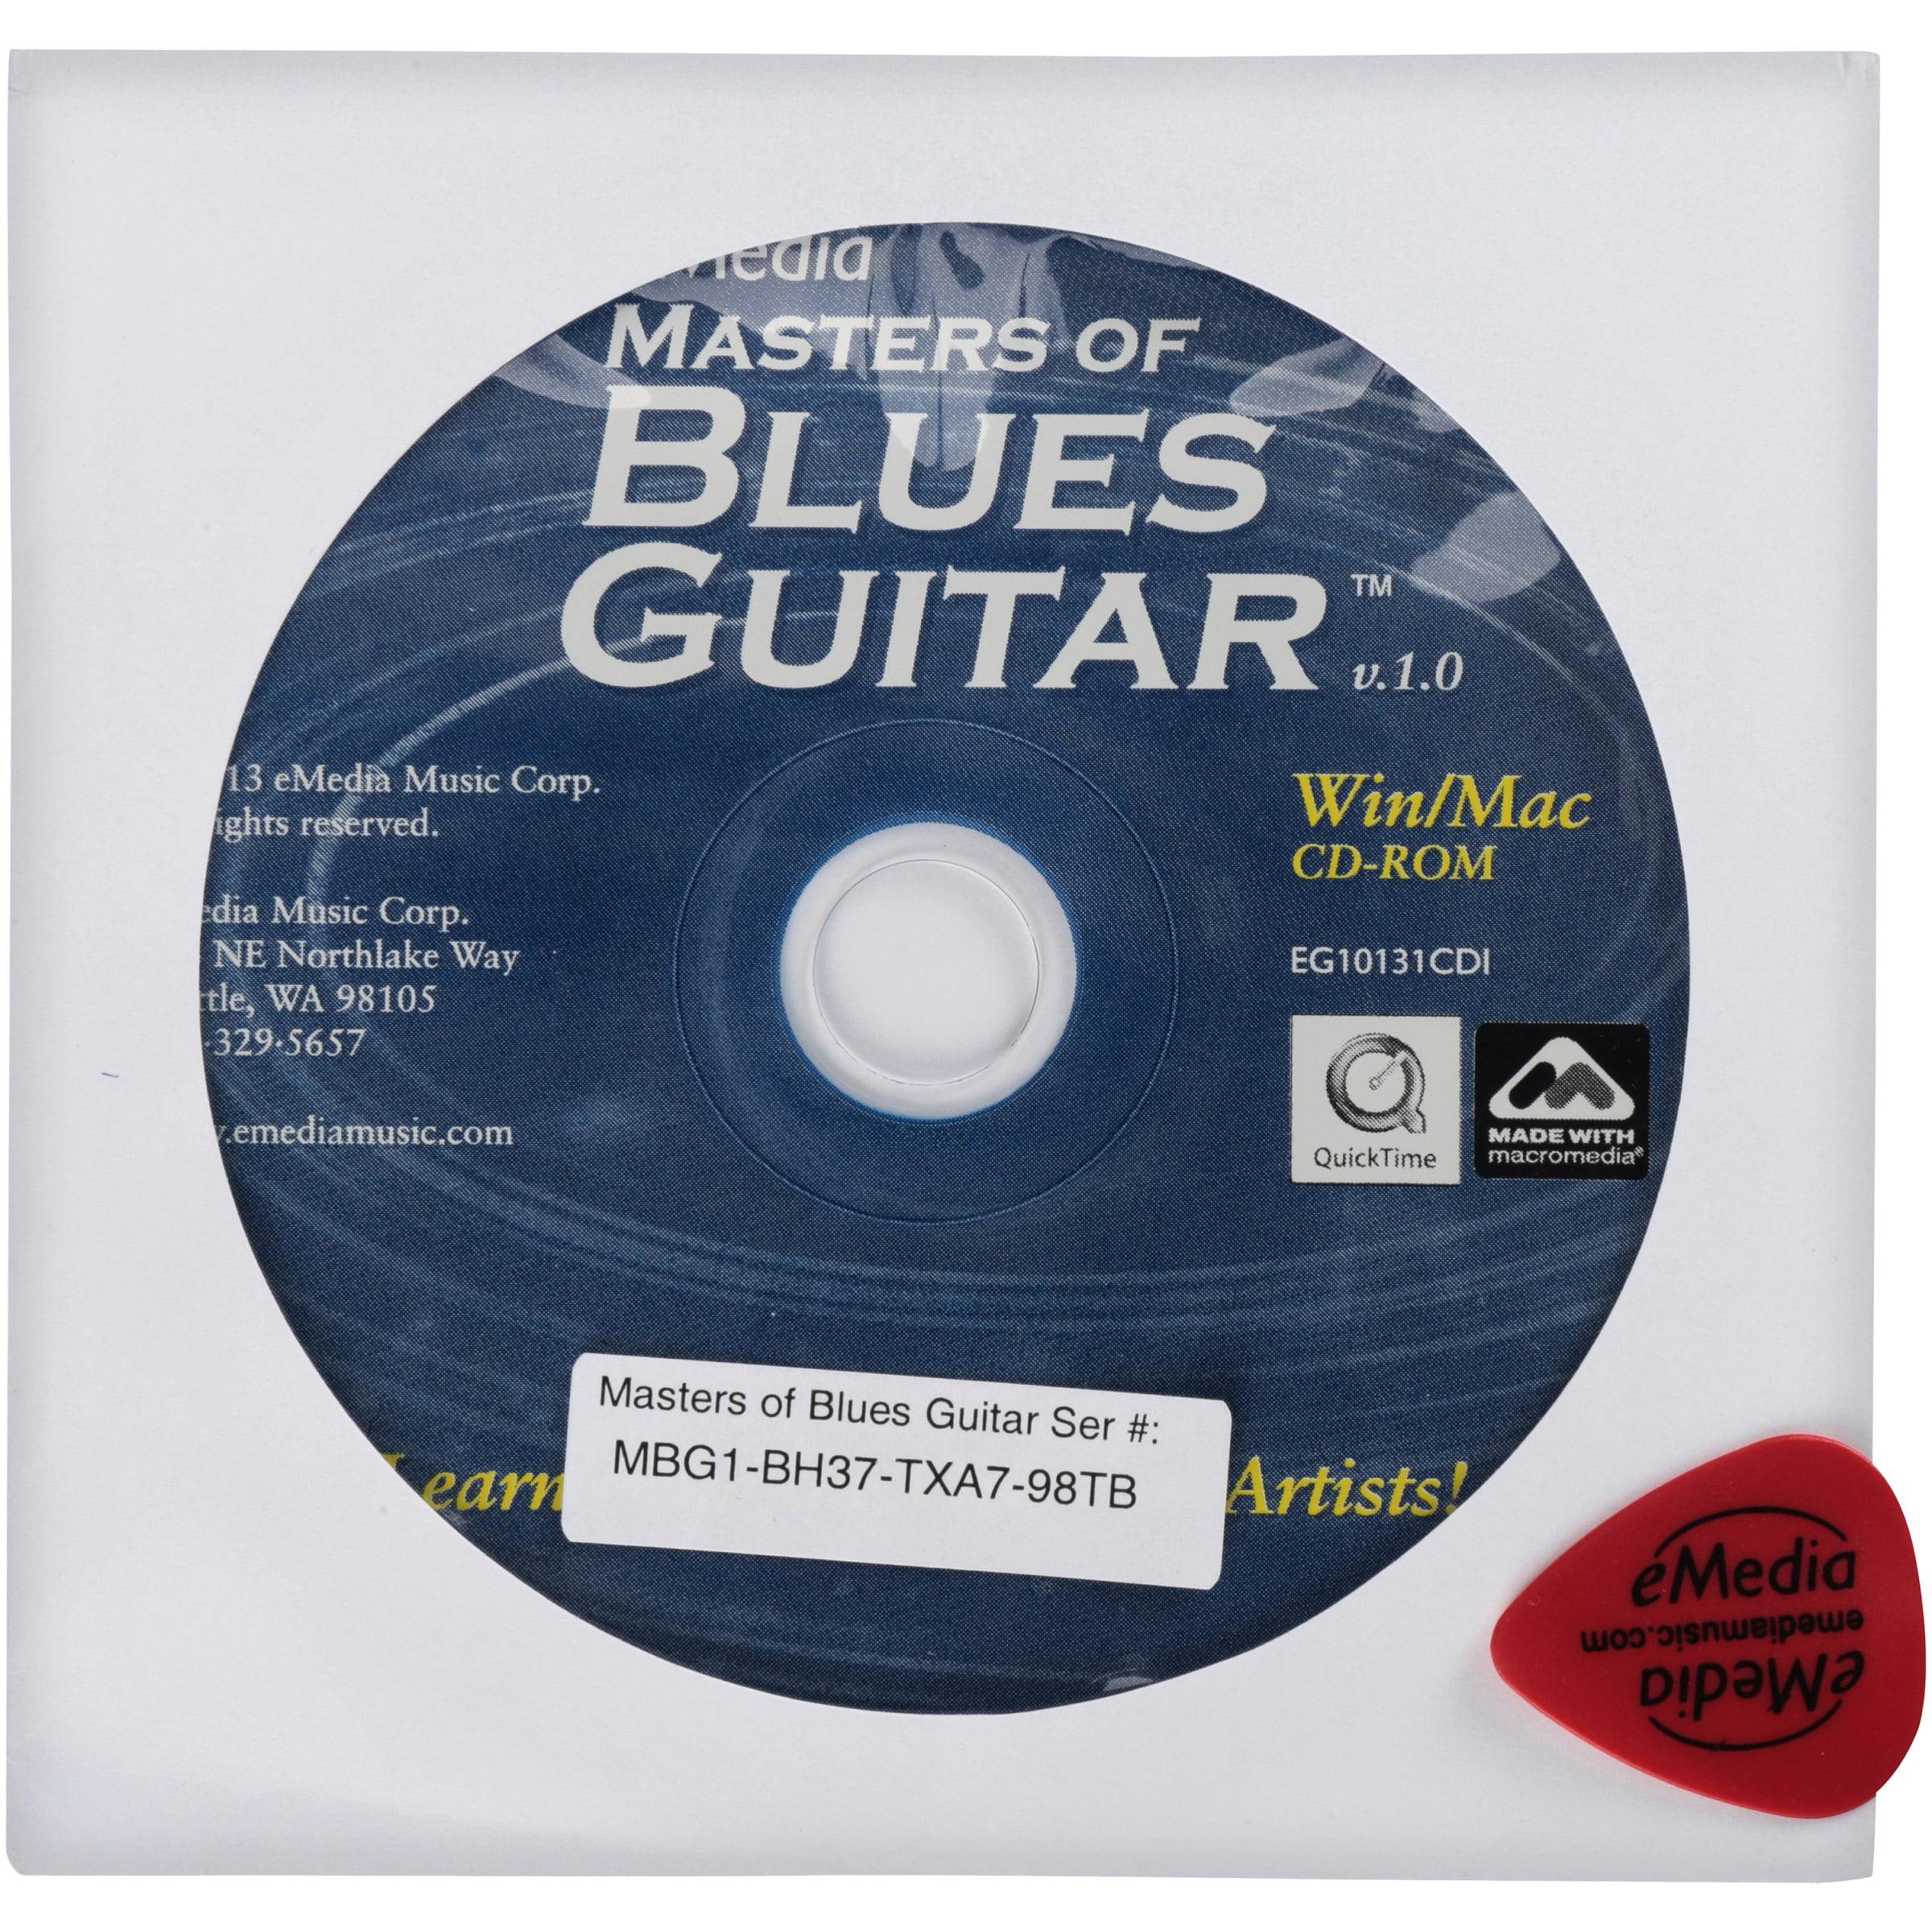 eMedia Masters of Blues Guitar Win Mac Interactive Software by eMedia Music Corp.